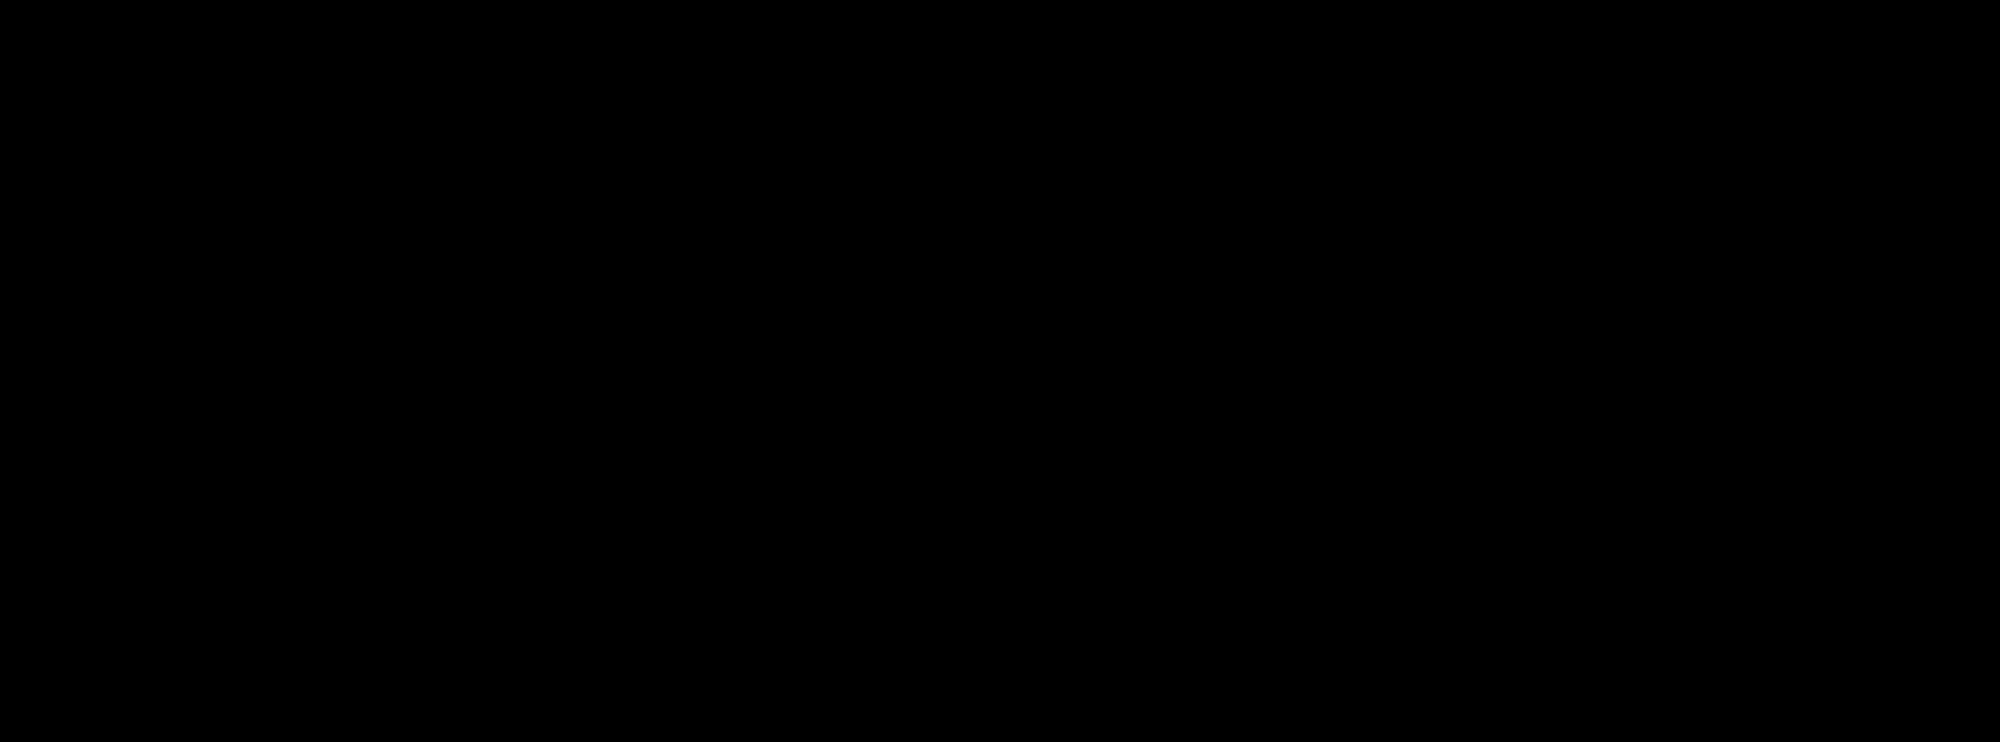 Will R. Logan-logo-new.png